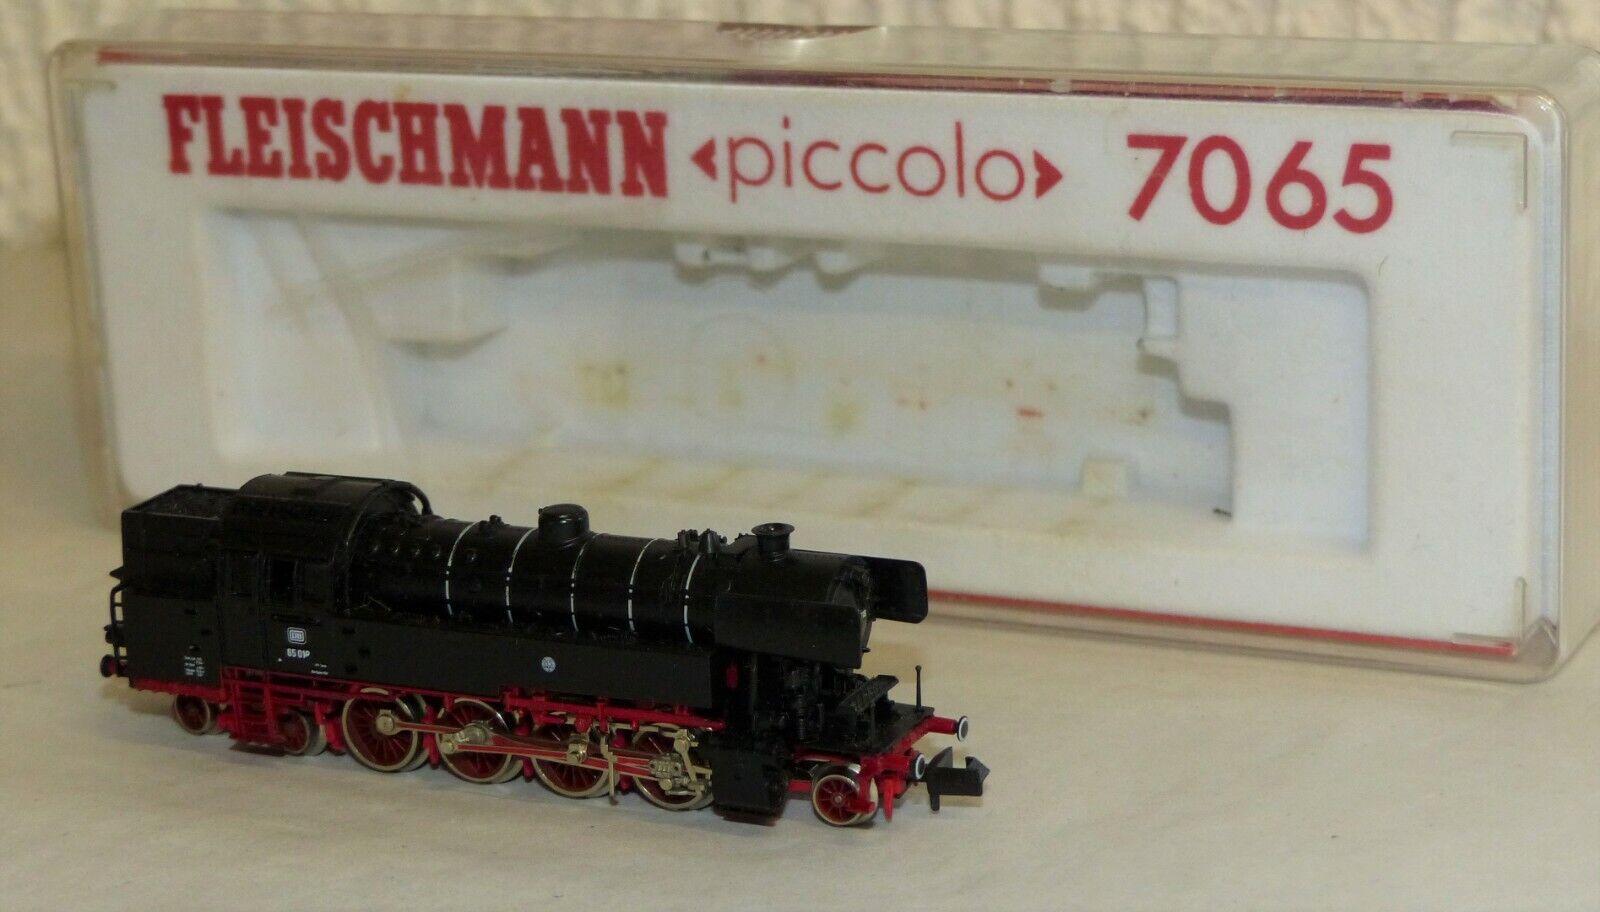 Fleischmann 7065 máquina de vapor br 65 018 DB pista n OVP